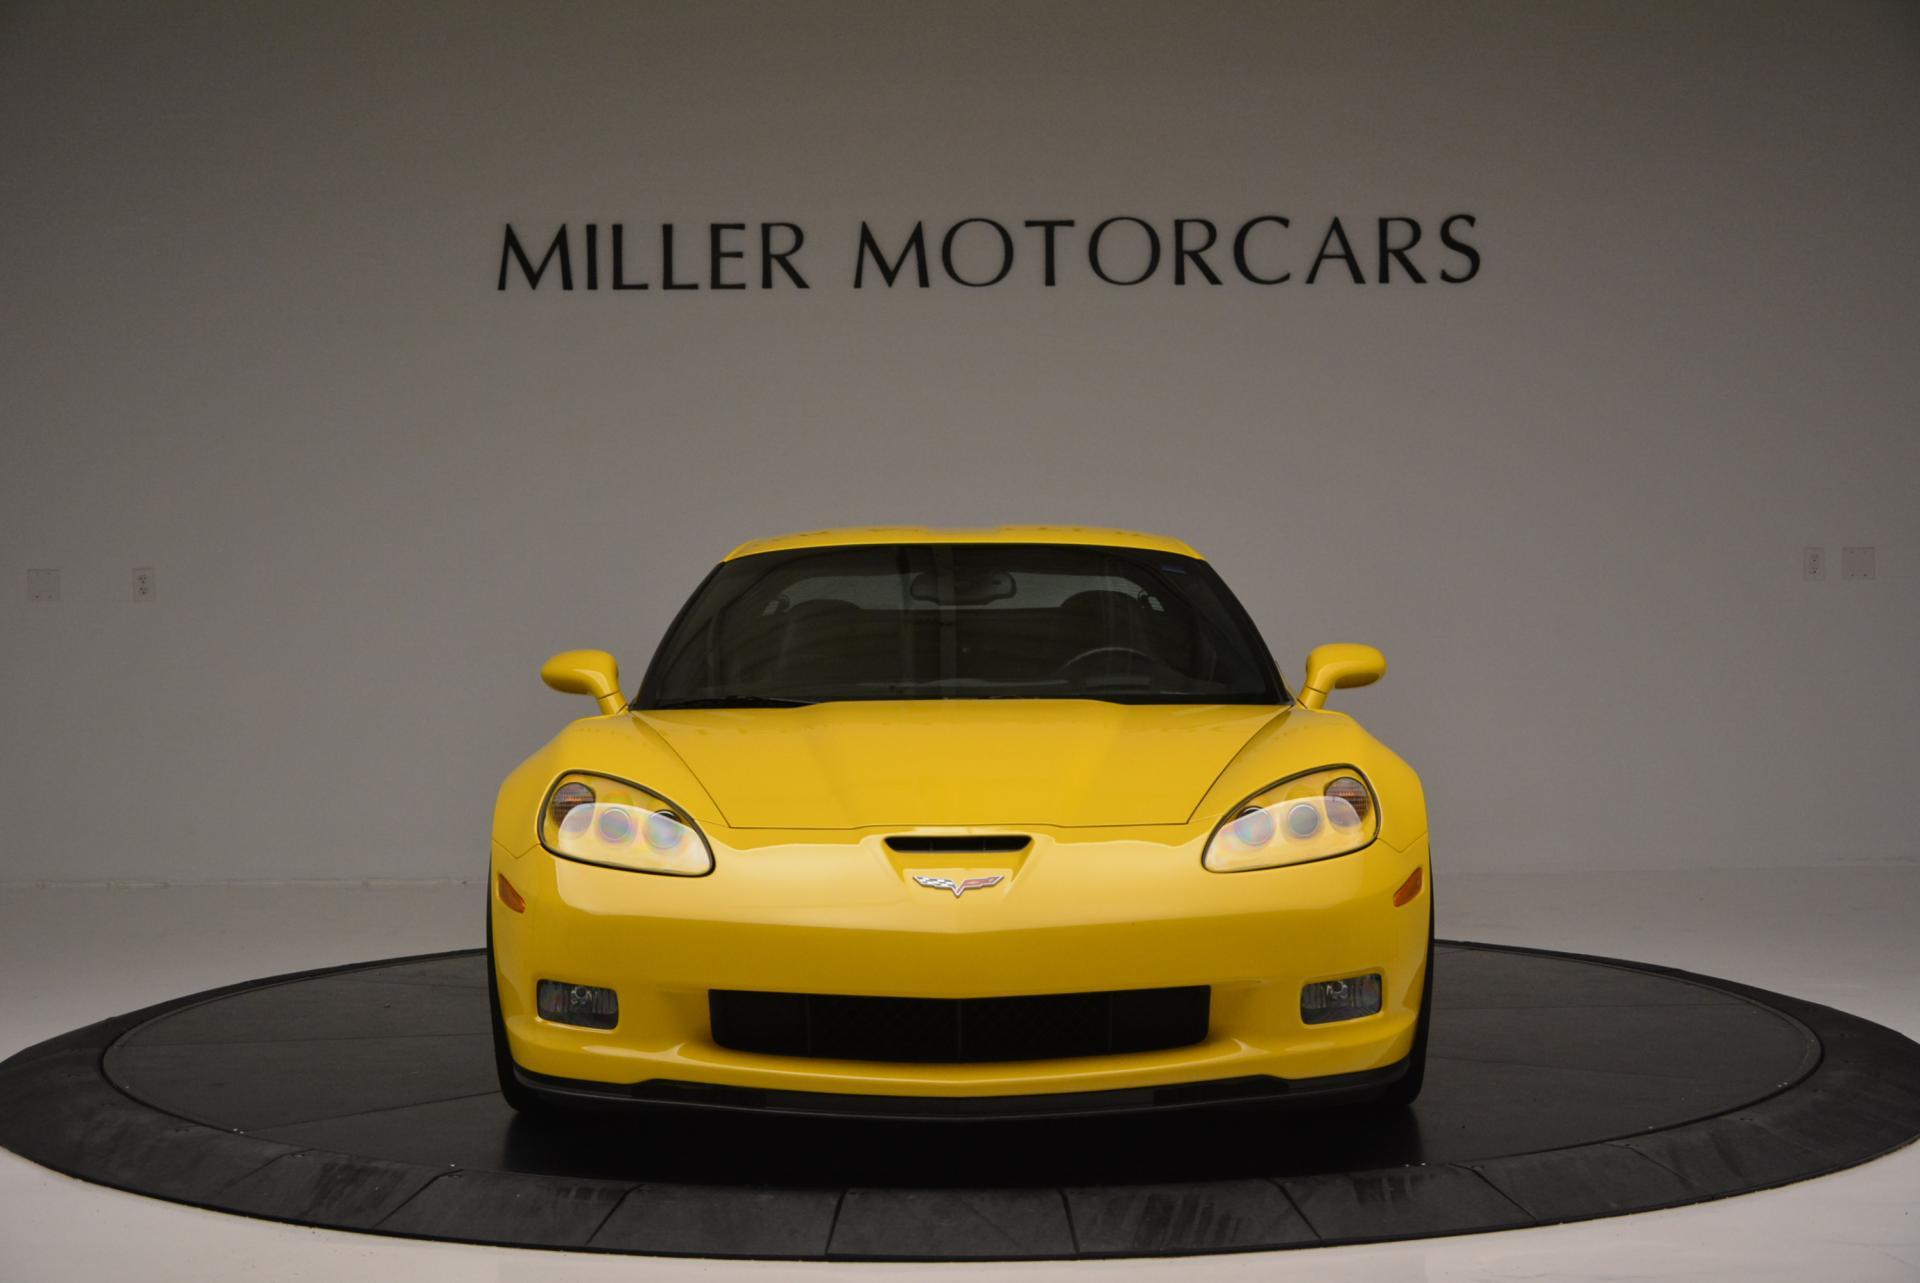 Used 2006 Chevrolet Corvette Z06 Hardtop For Sale In Greenwich, CT. Alfa Romeo of Greenwich, 7085 530_p5